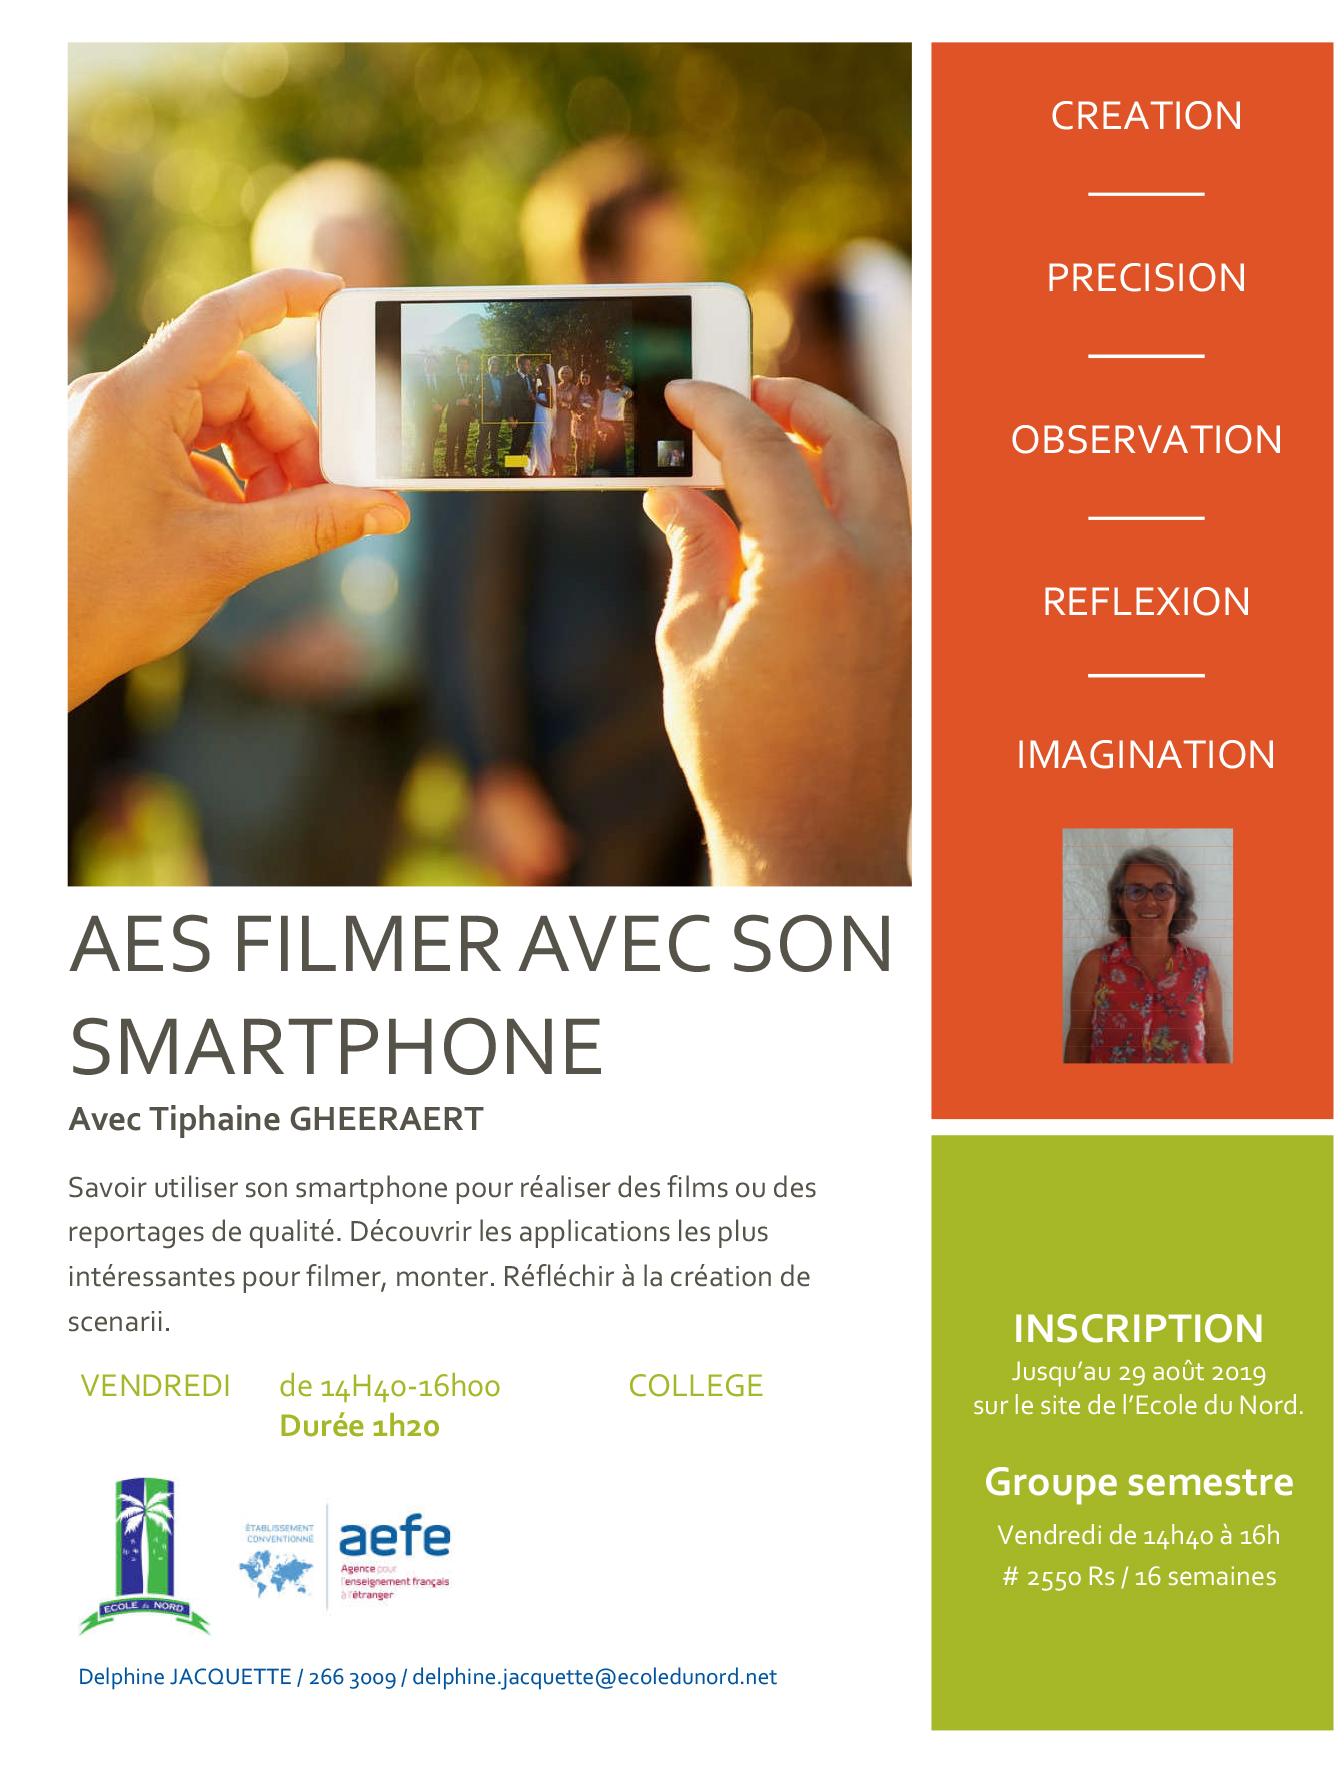 AES 2019-2020 fiches-5 copie